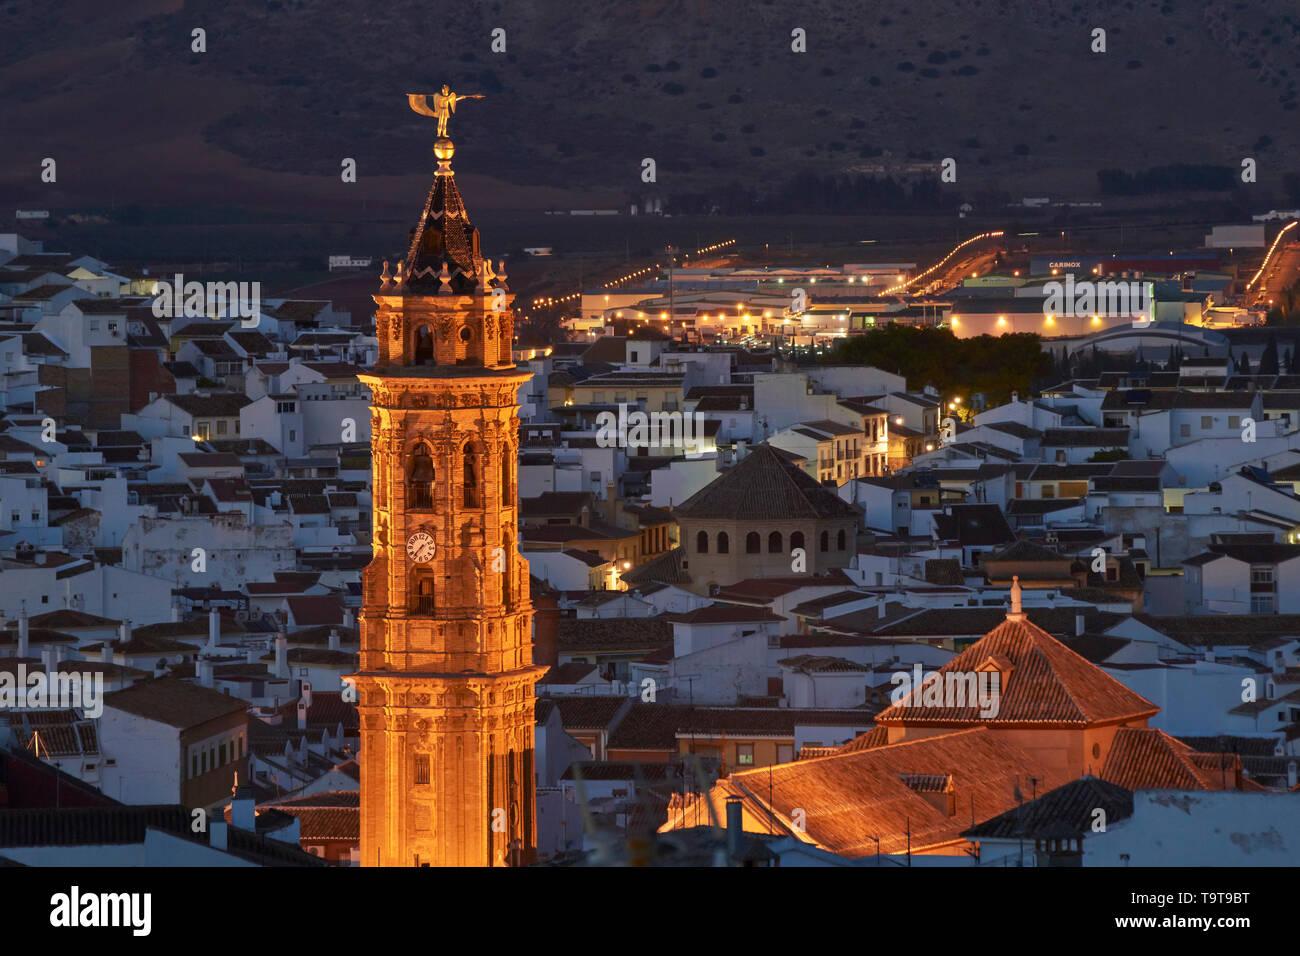 Antequera by Night, Málaga. World Heritage. Tower of San Sebastian church illuminated at night. - Stock Image